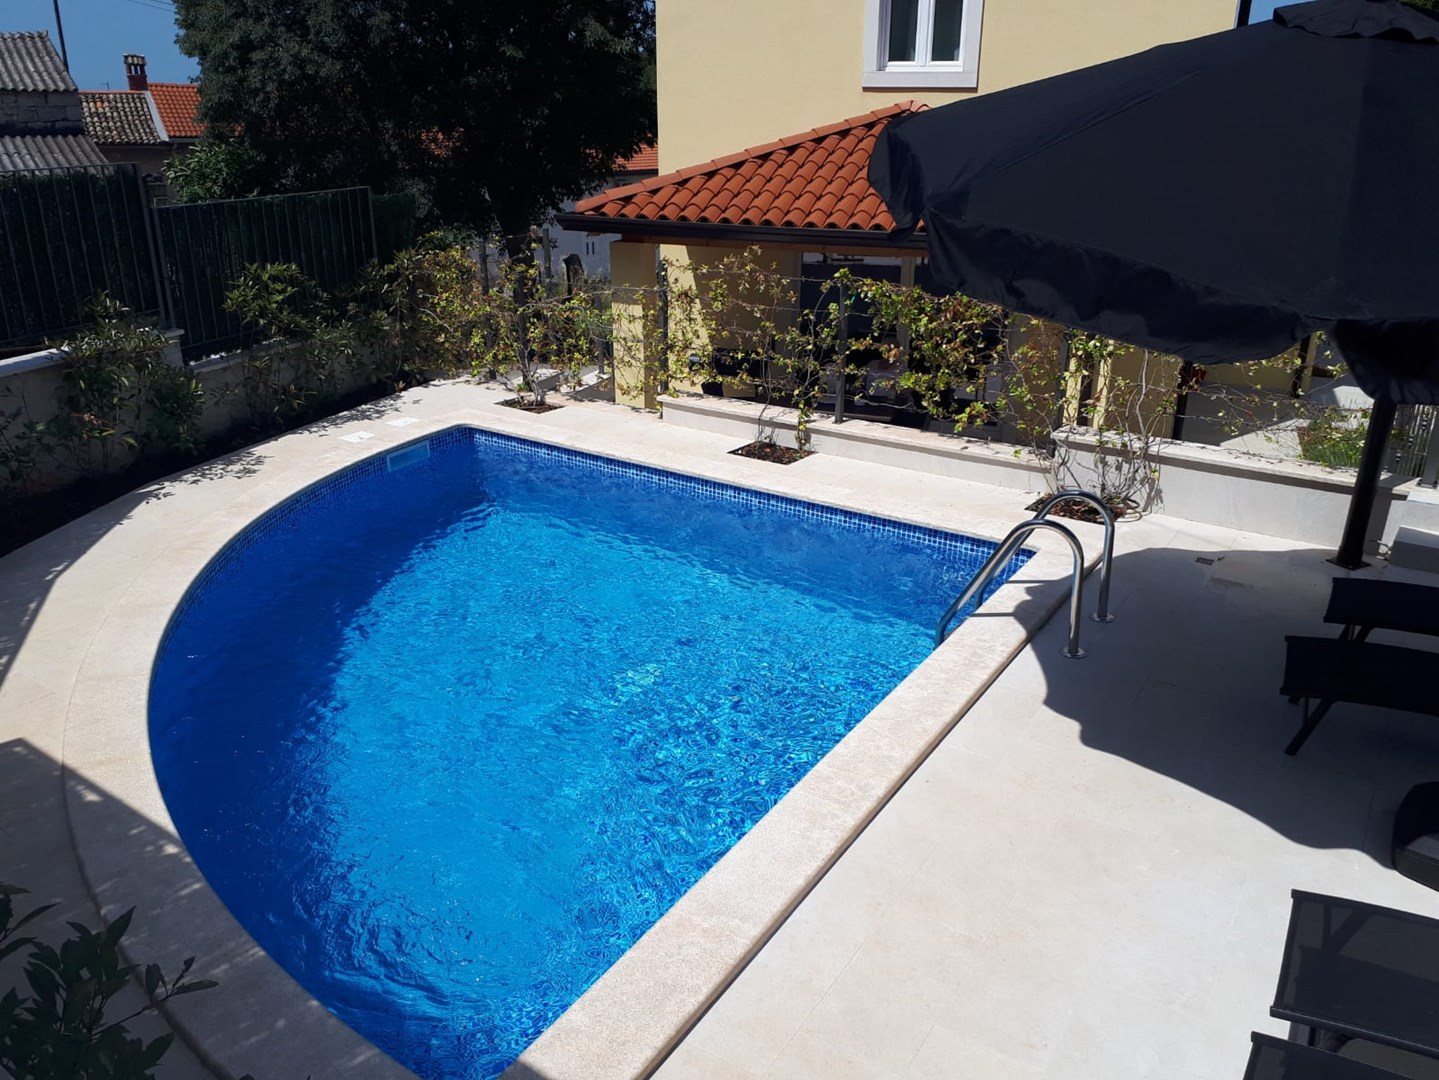 Ferienhaus Villa Albina mit privatem Pool in der Nähe von Aquacolors (2240246), Mugeba, , Istrien, Kroatien, Bild 2